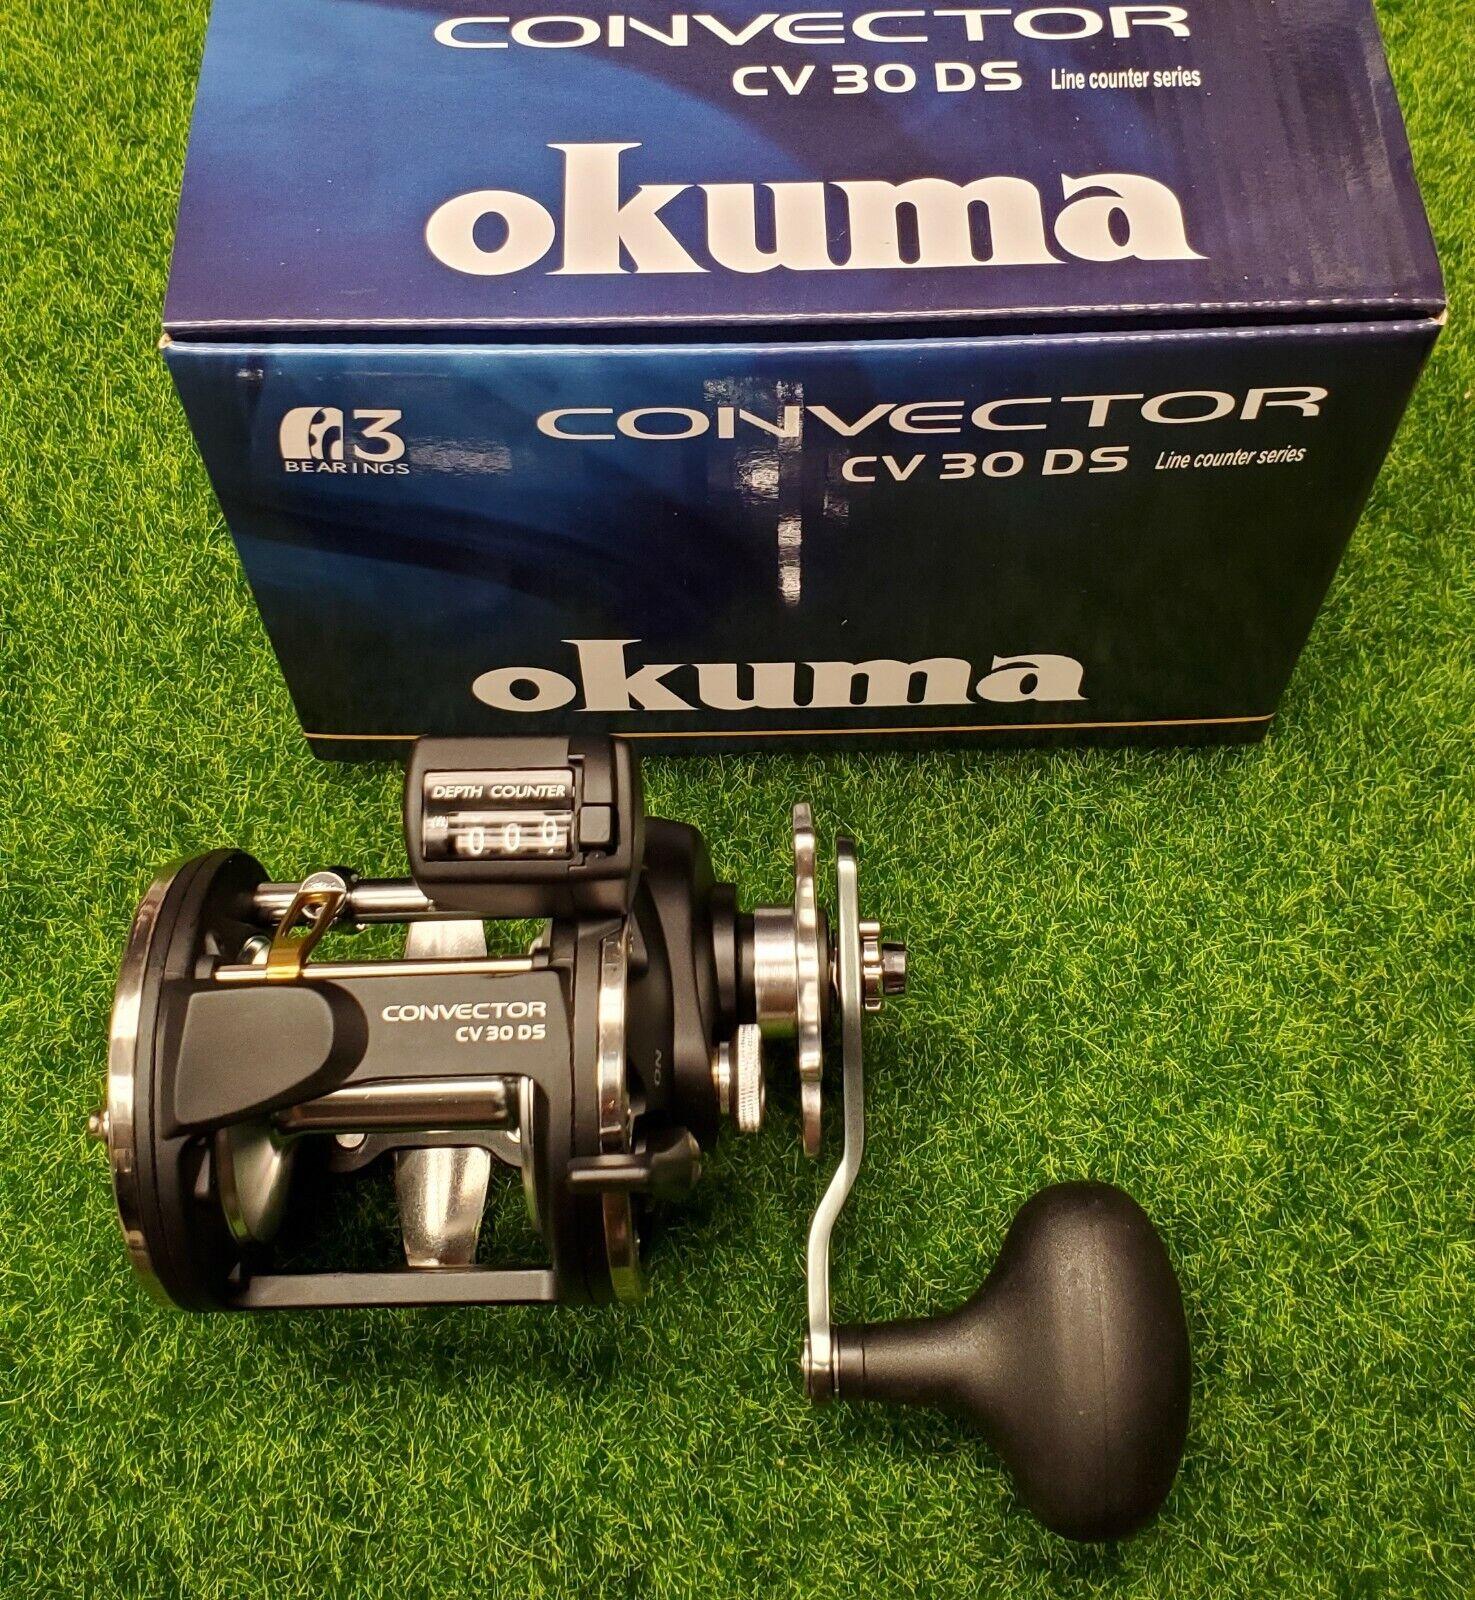 Okuma Convector Drag Star Line Contador Rollo